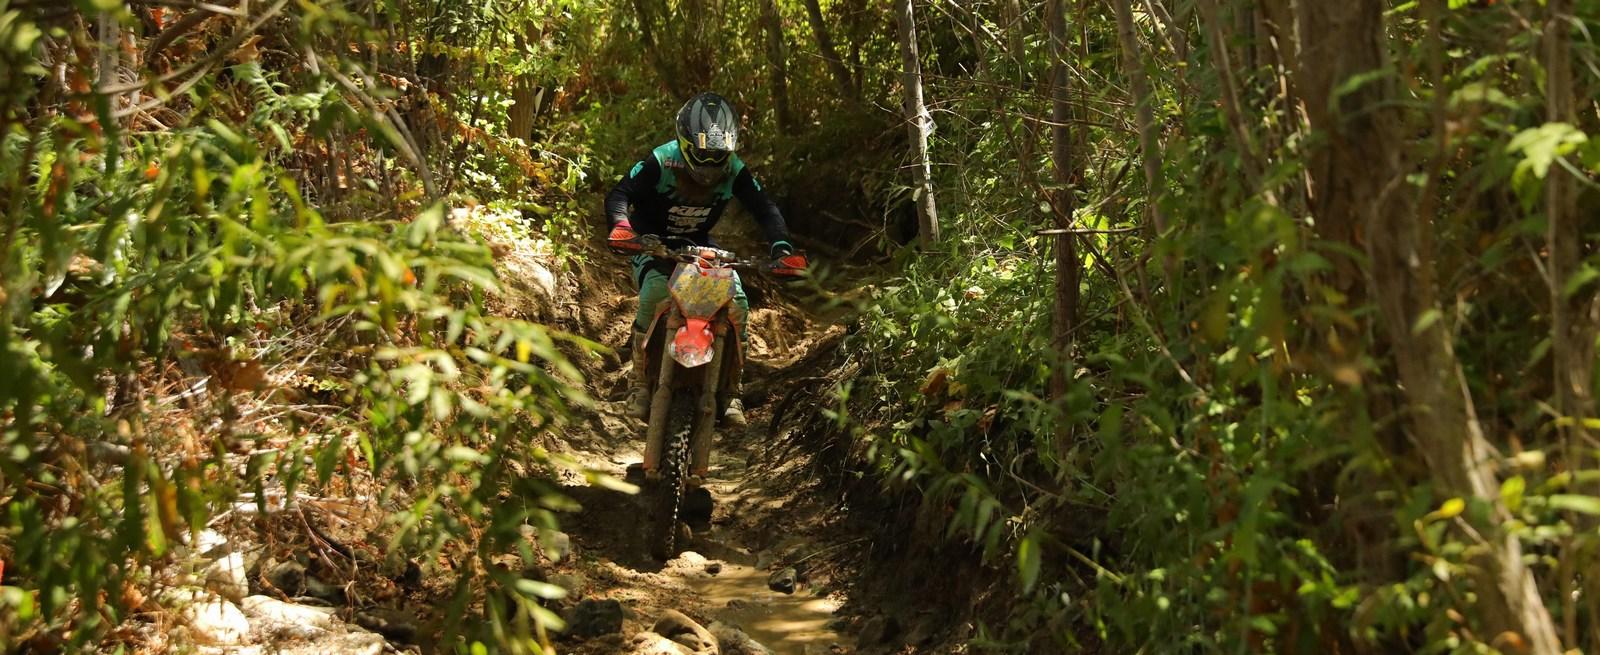 2019-bike-09-gary-sutherlin-worcs-racing